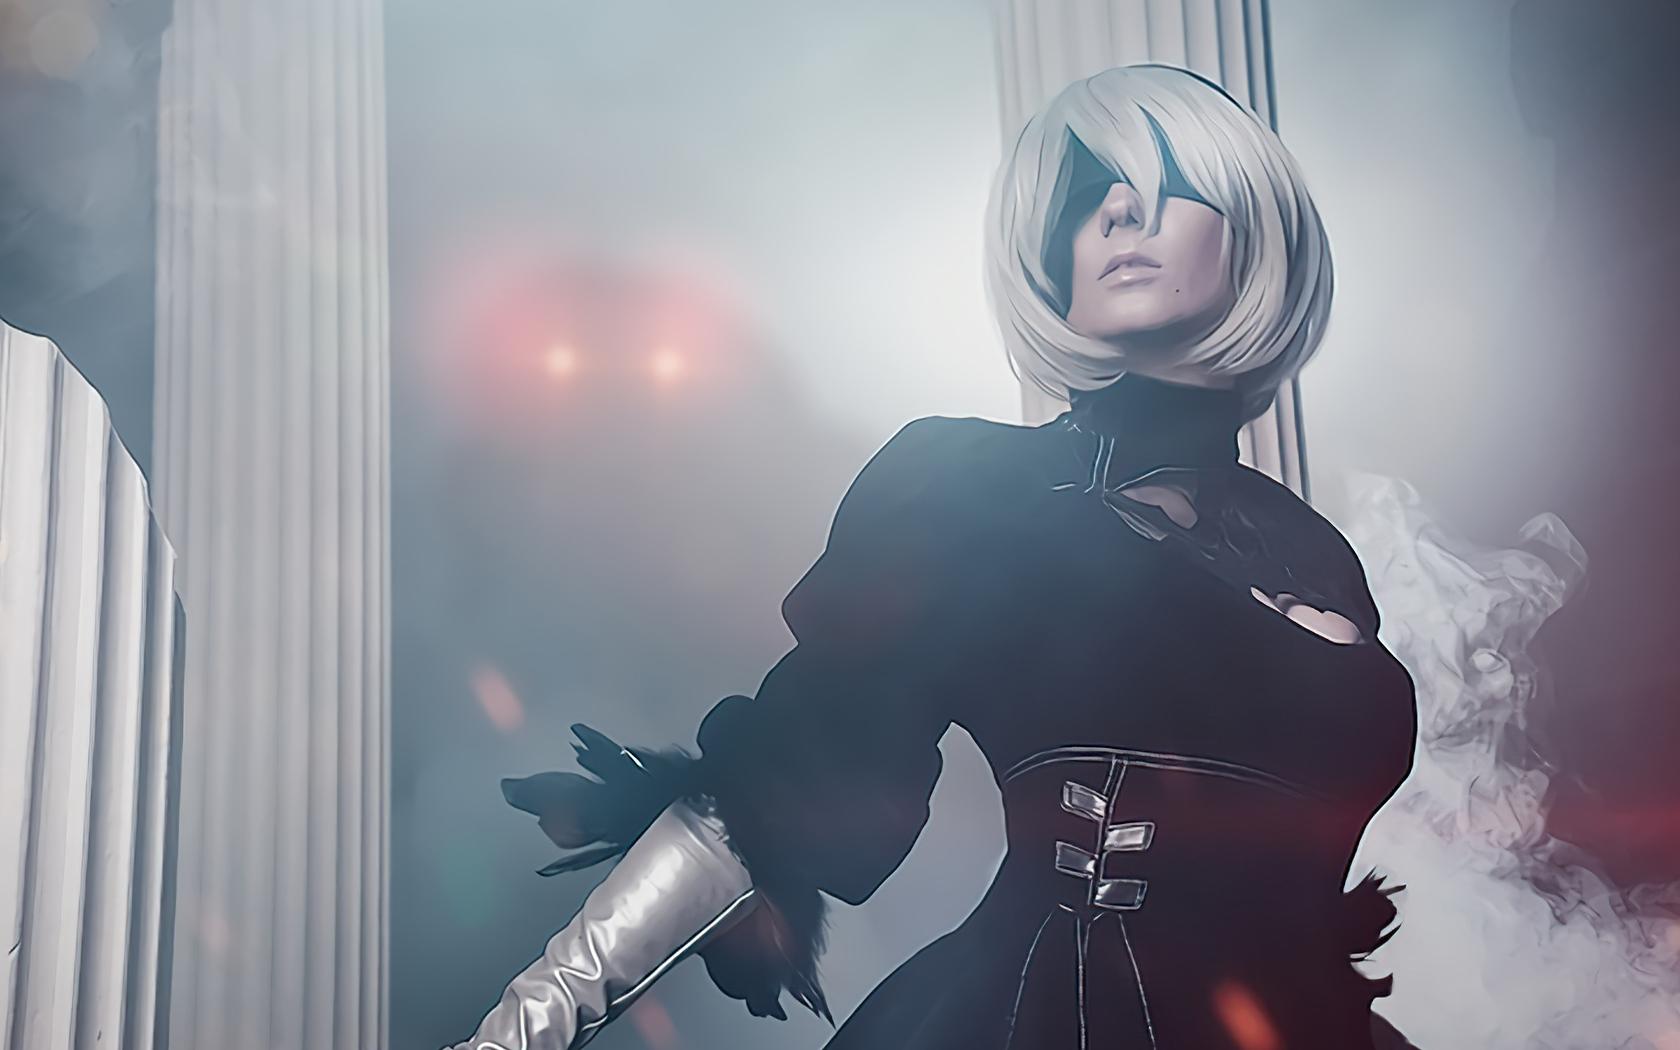 nier-automata-2b-cosplay-girl-4k-o8.jpg